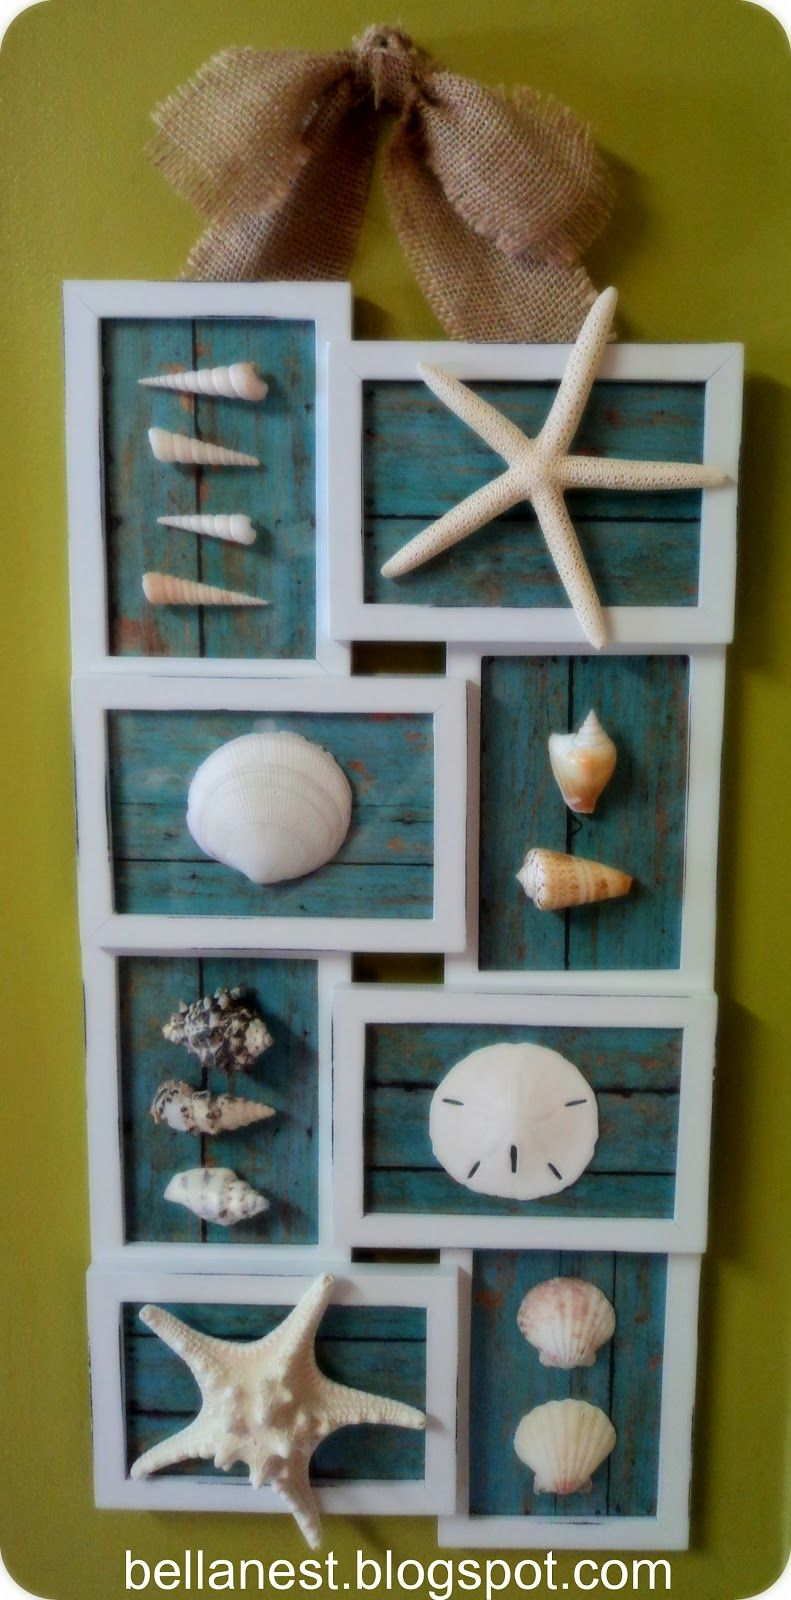 Bella Nest: Show off your seashells! | Creative Genius | Pinterest ...